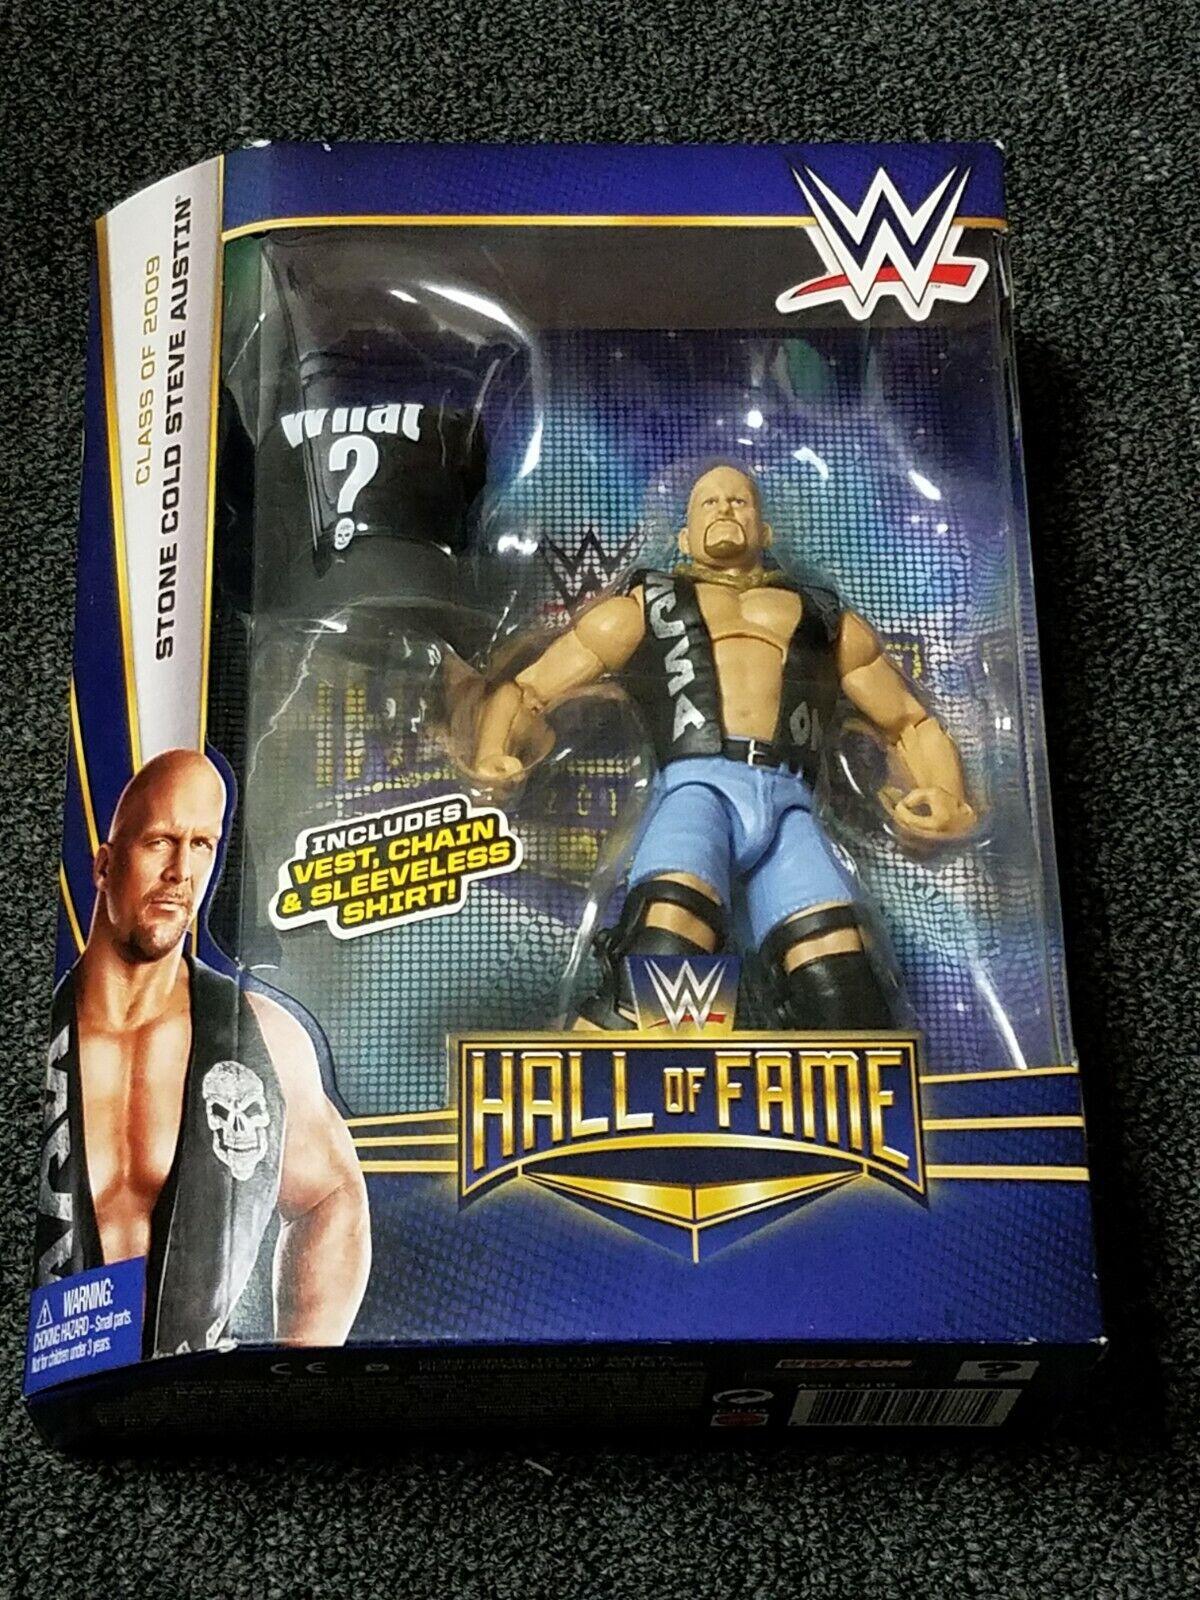 MATTEL ELITE WWE HALL OF FAME  STEVE AUSTIN SCSA FIGURE TARGET EXCLUSIVE